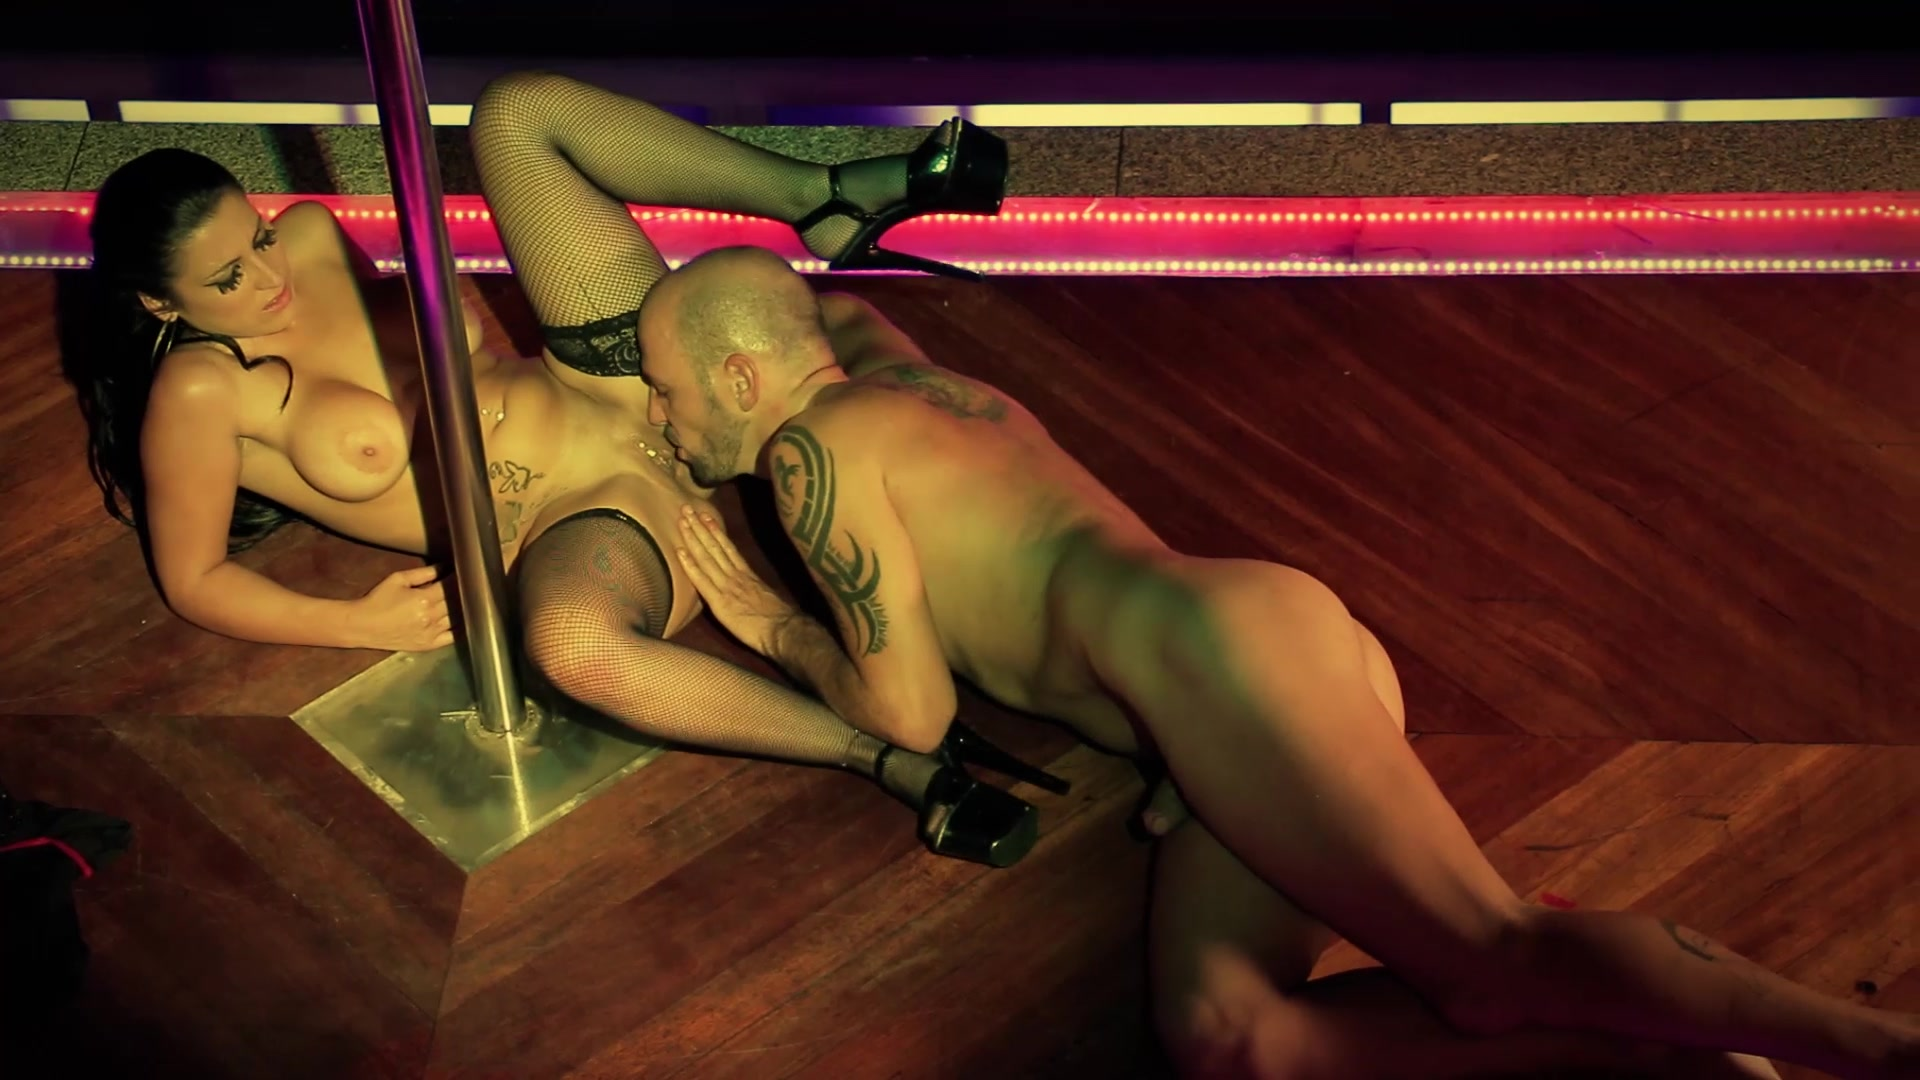 Fucking Stripper On The Stage, Free Xxx Stripper Porn Photo